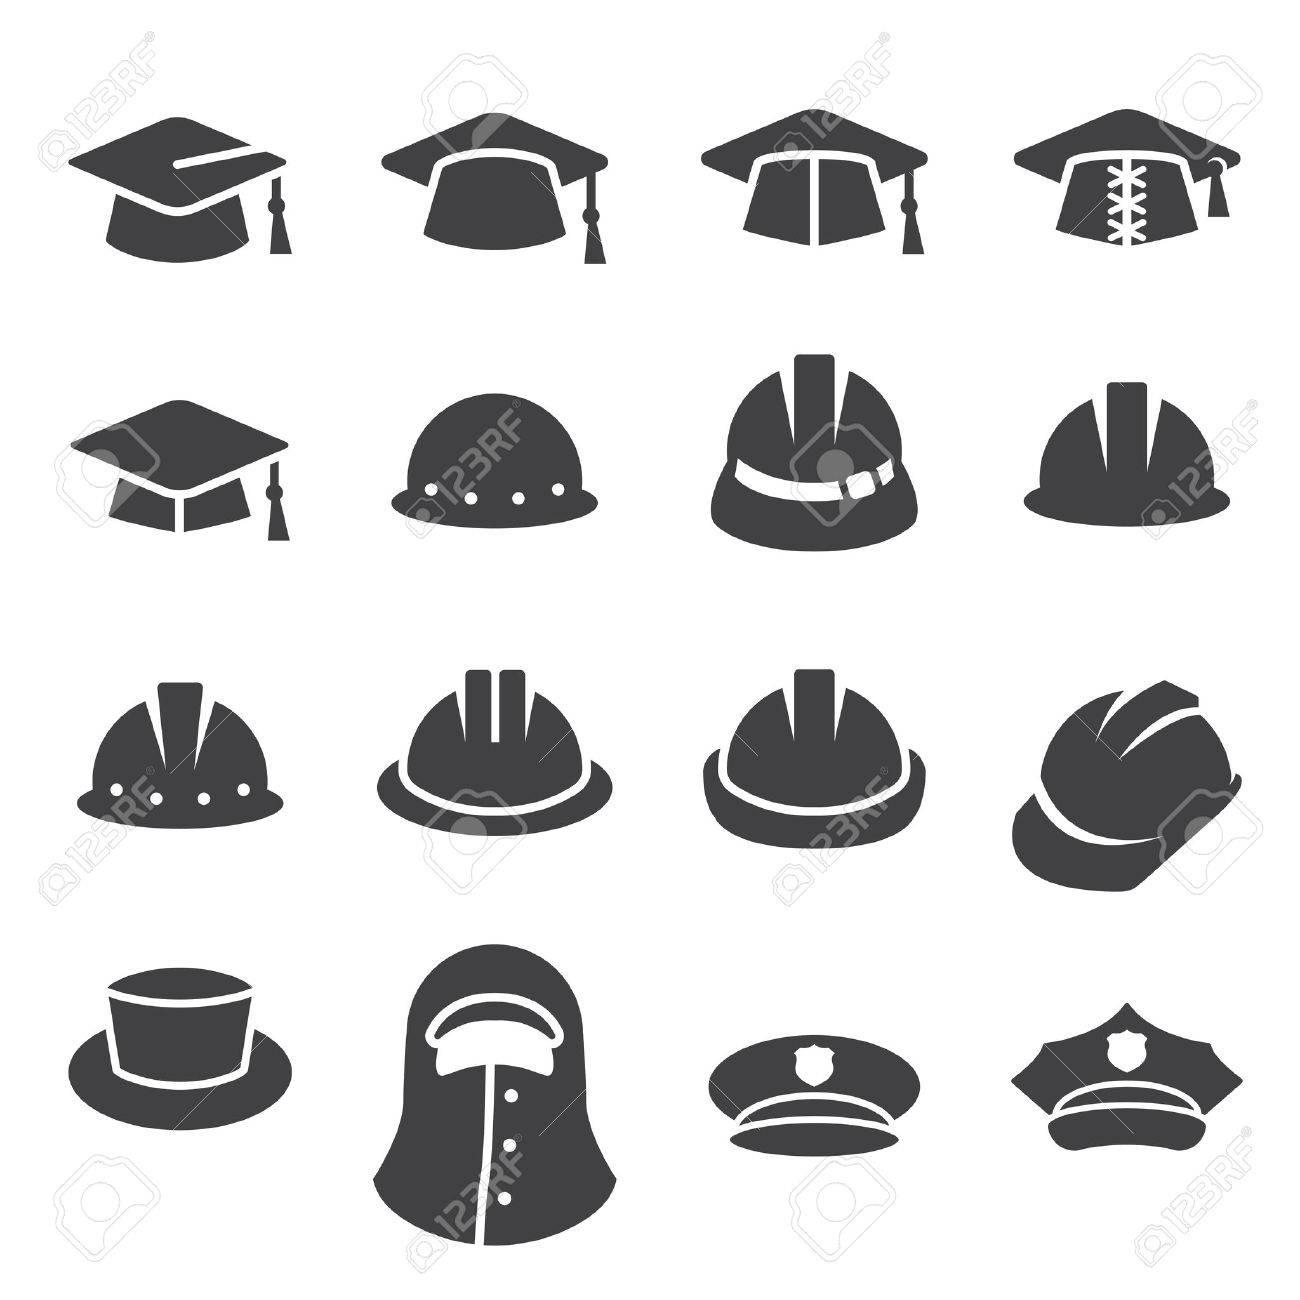 hat icon set - 45231574